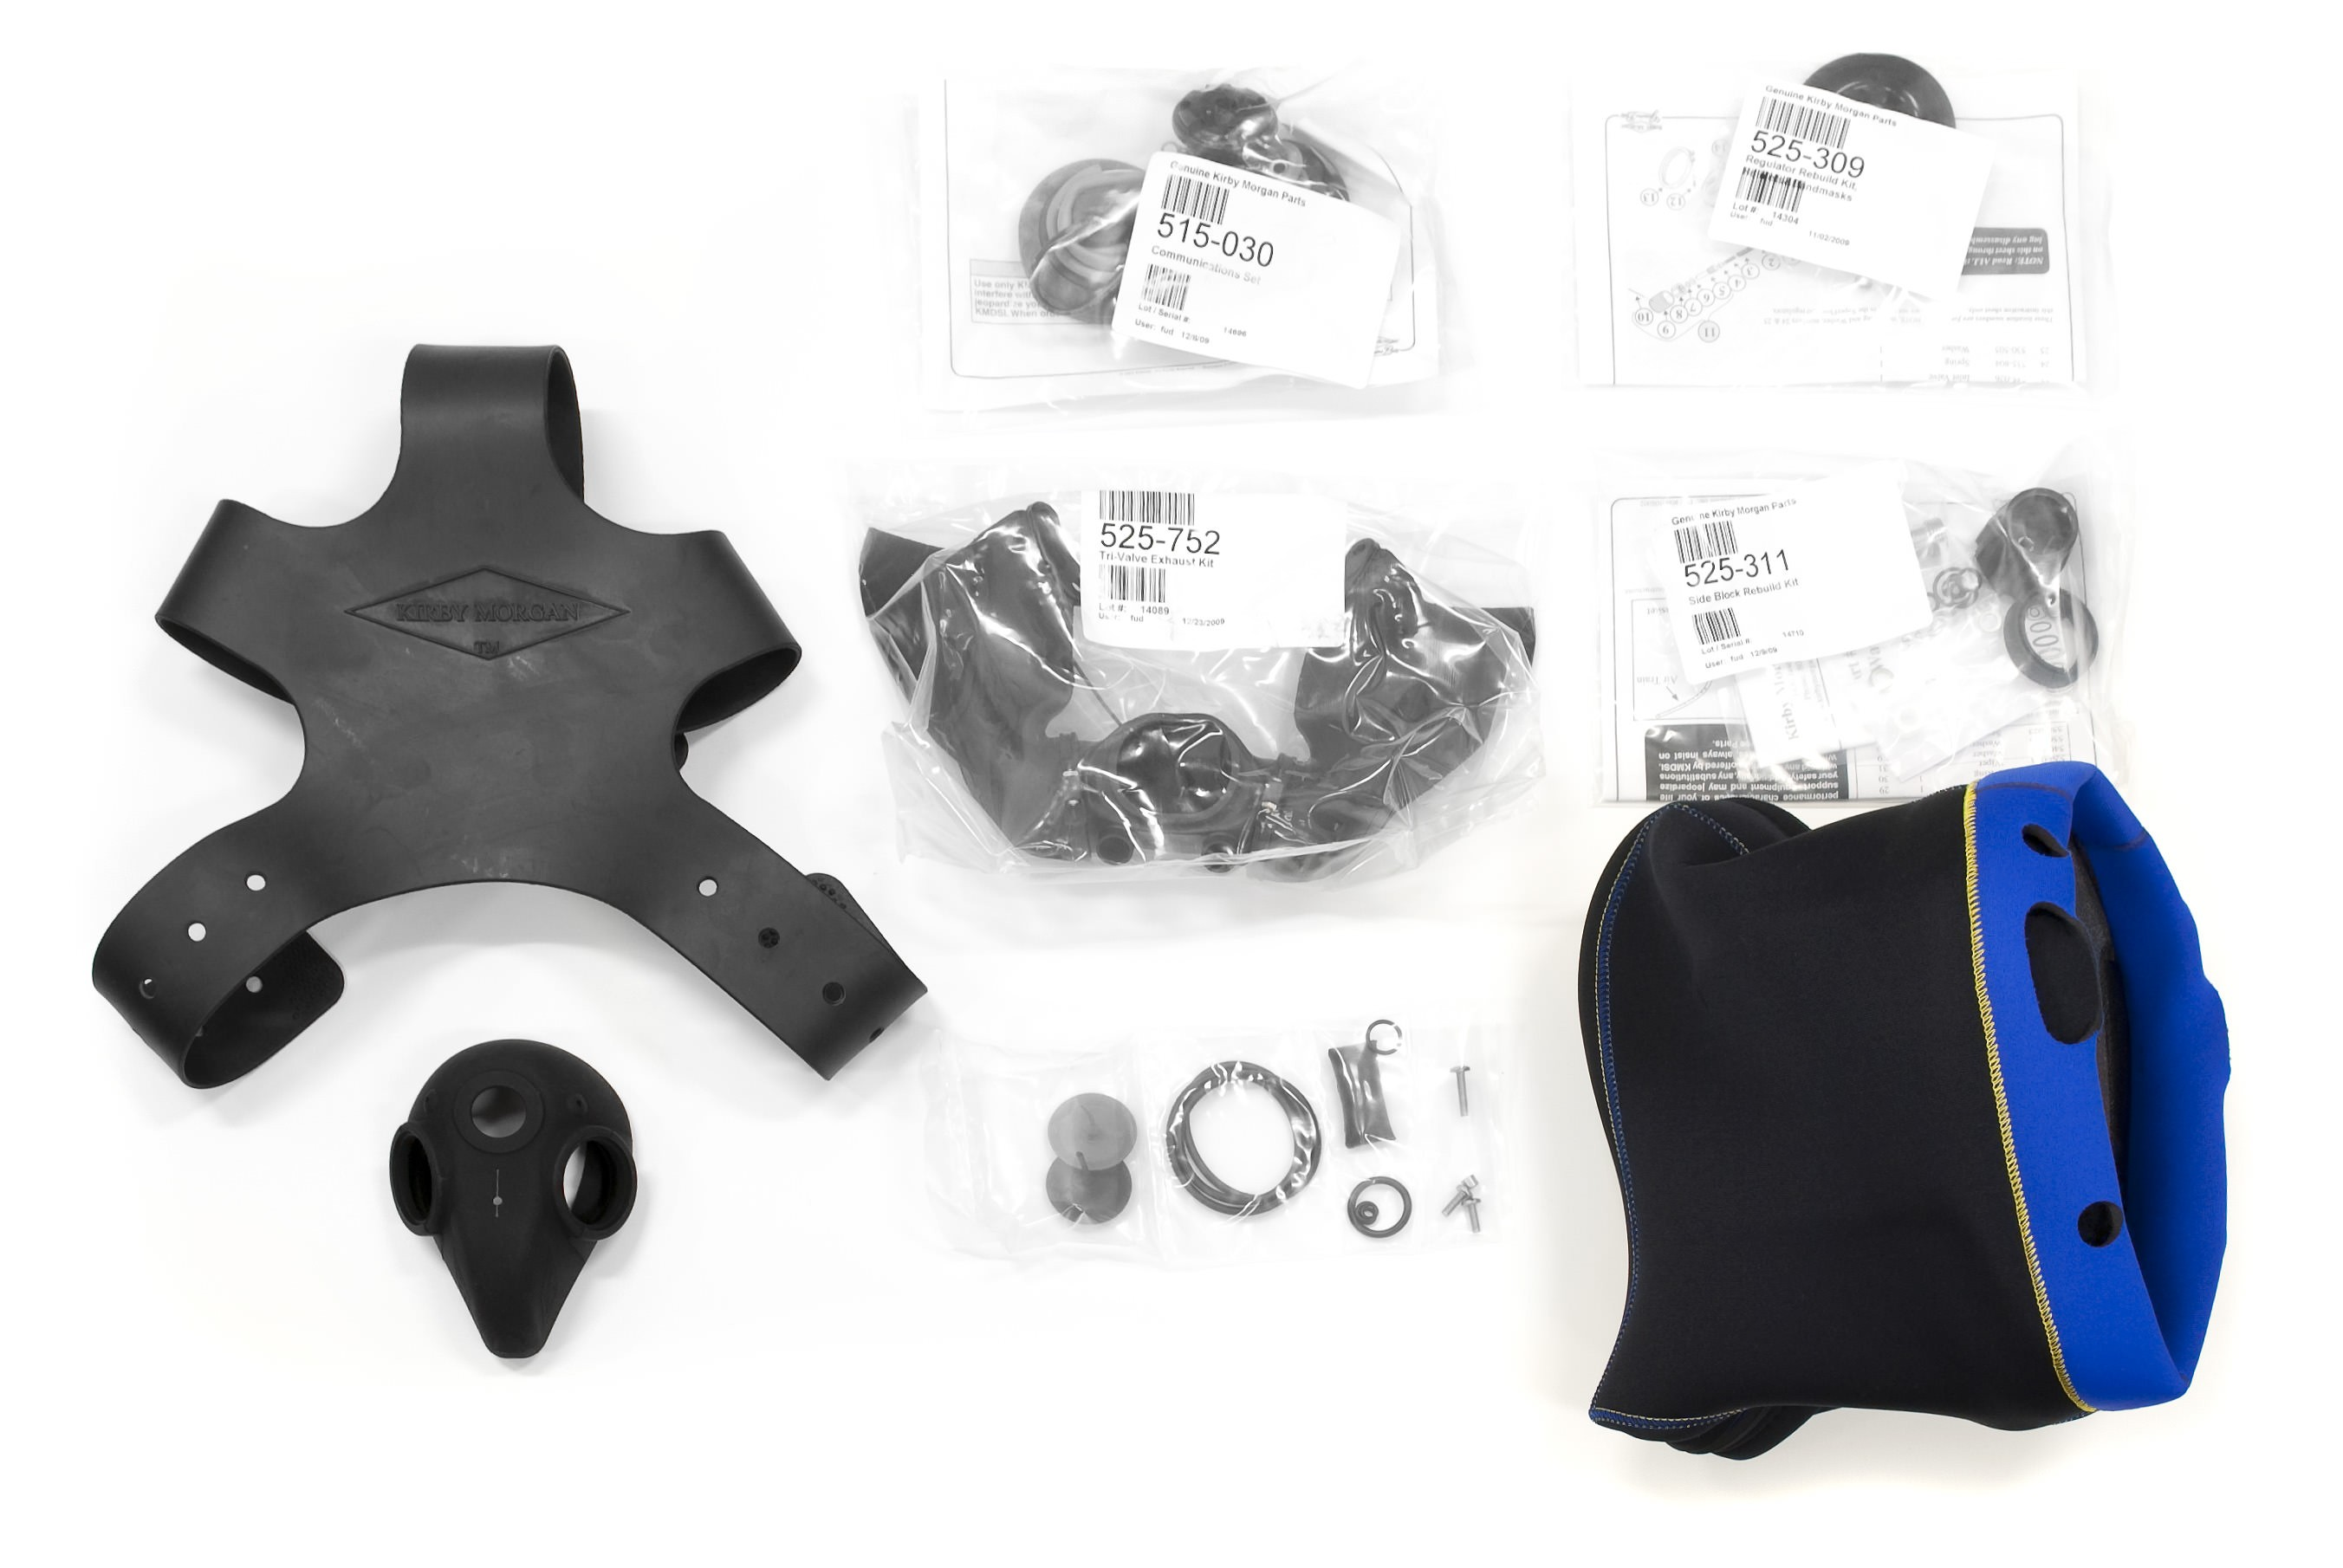 Kirby Morgan Mask Spares Kit for KMB 18 and 28 BandMasks® 525-319